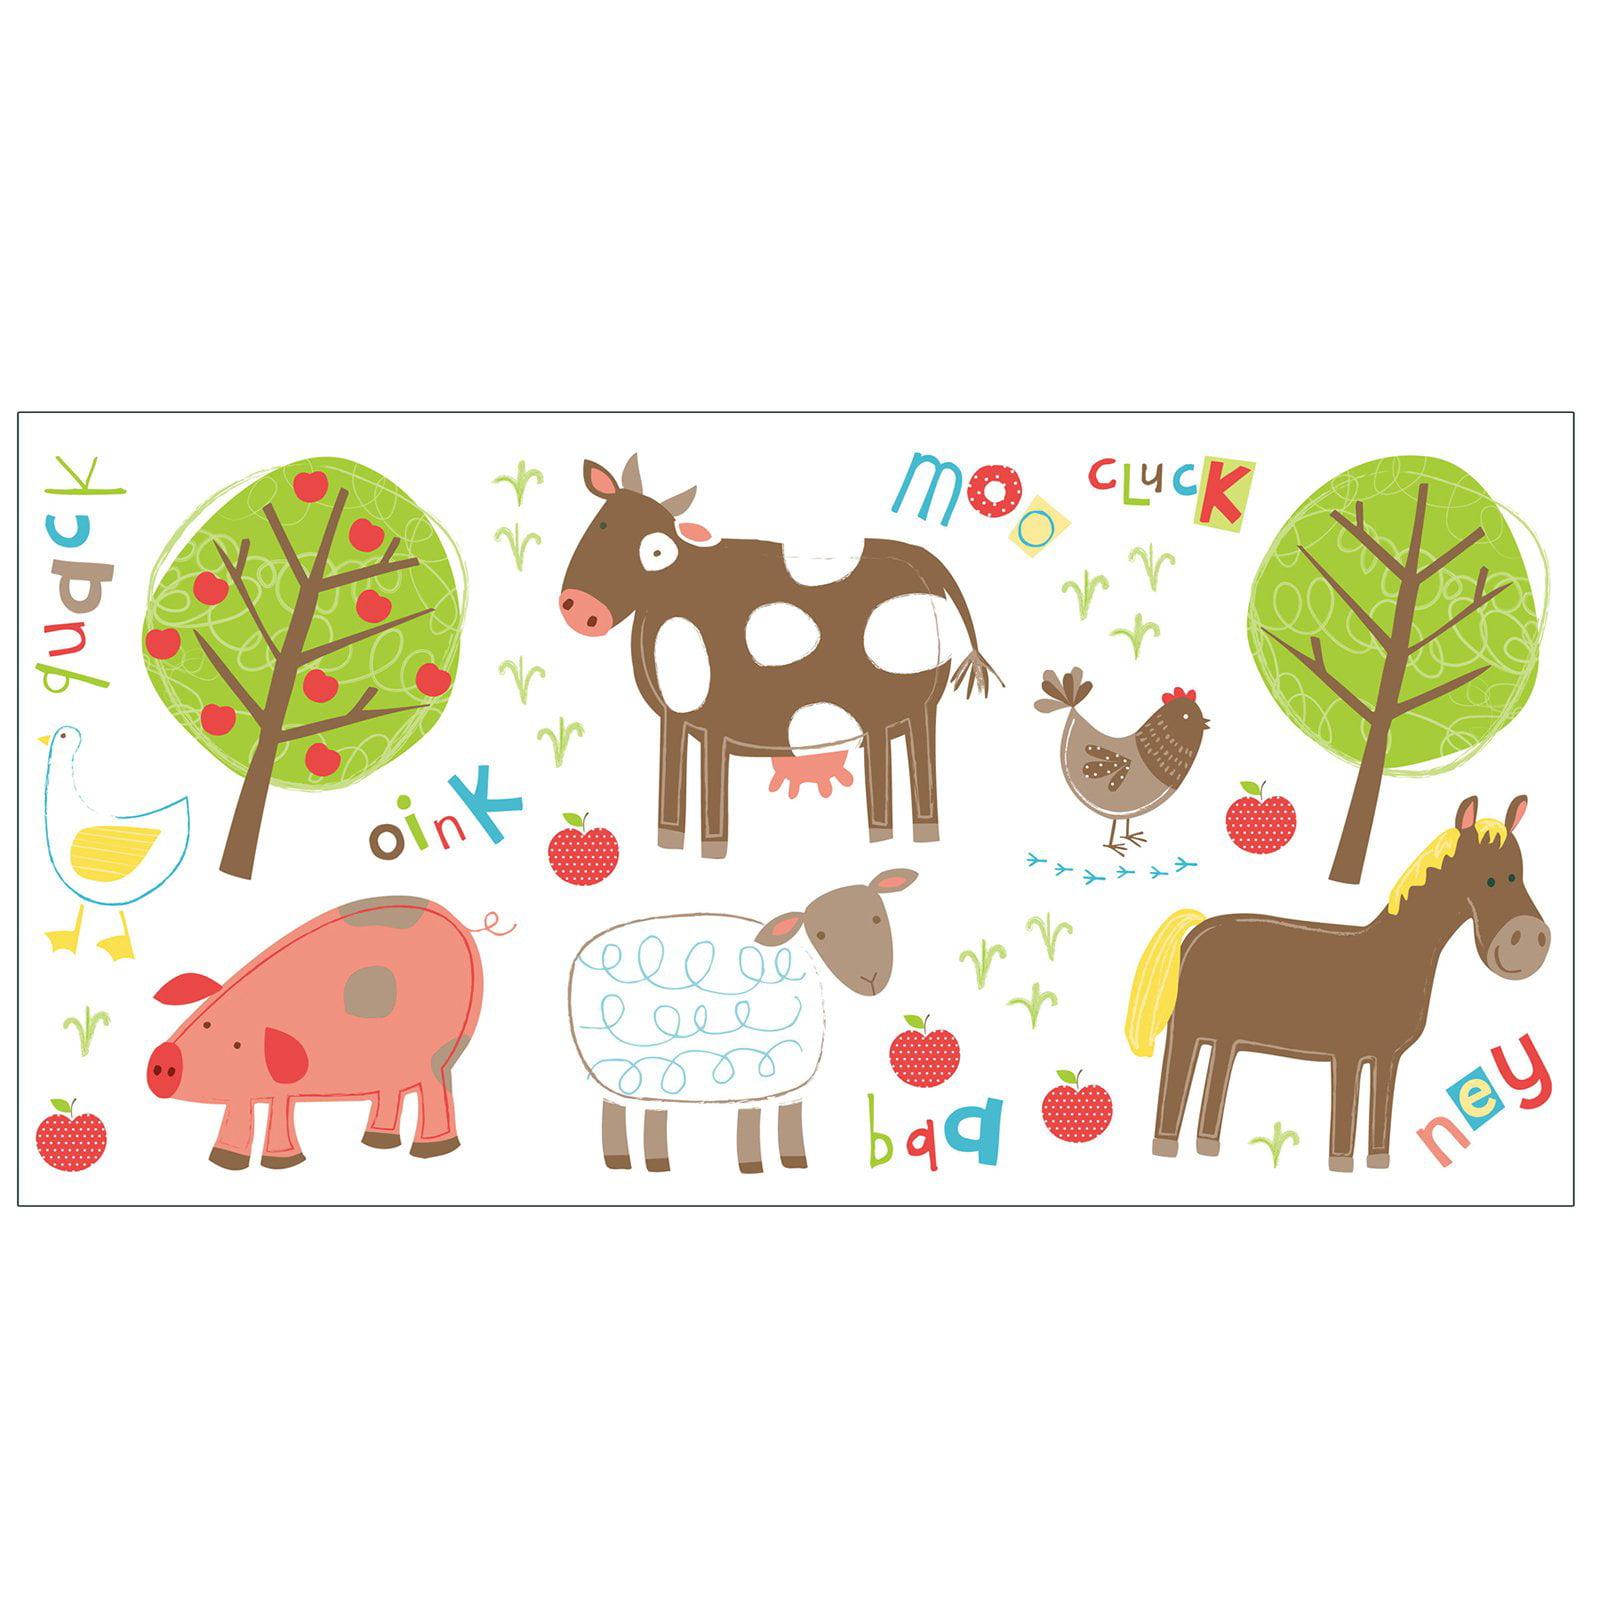 Fun4Walls Farm Wall Stickers Set of 50 by Fun4Walls